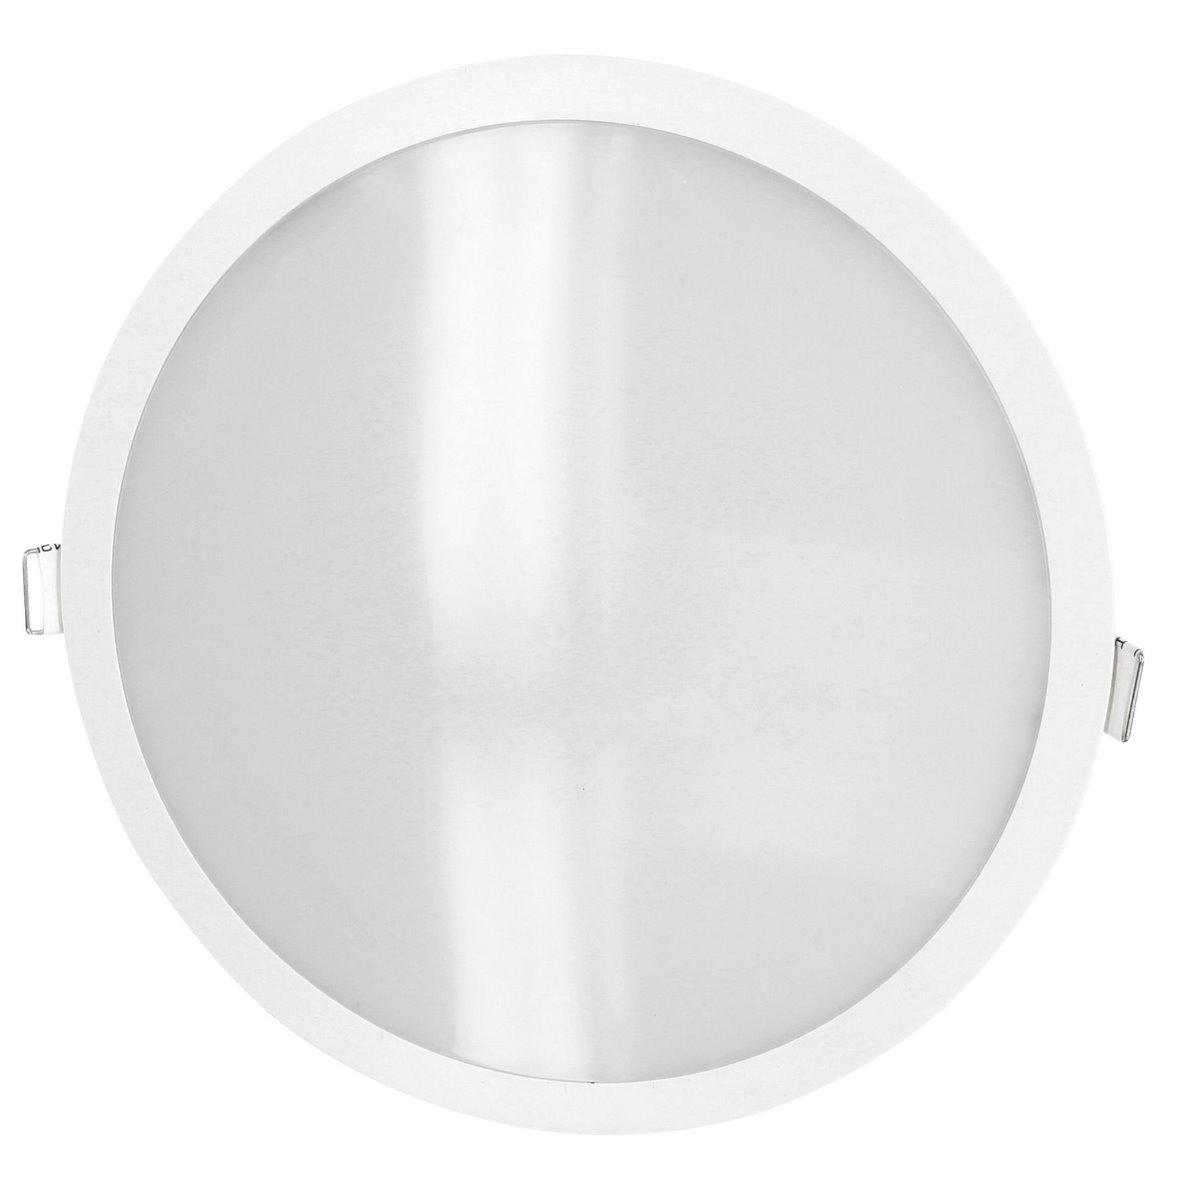 led spot feuchtraum einbauleuchte slim ip54 18w 1400lm. Black Bedroom Furniture Sets. Home Design Ideas